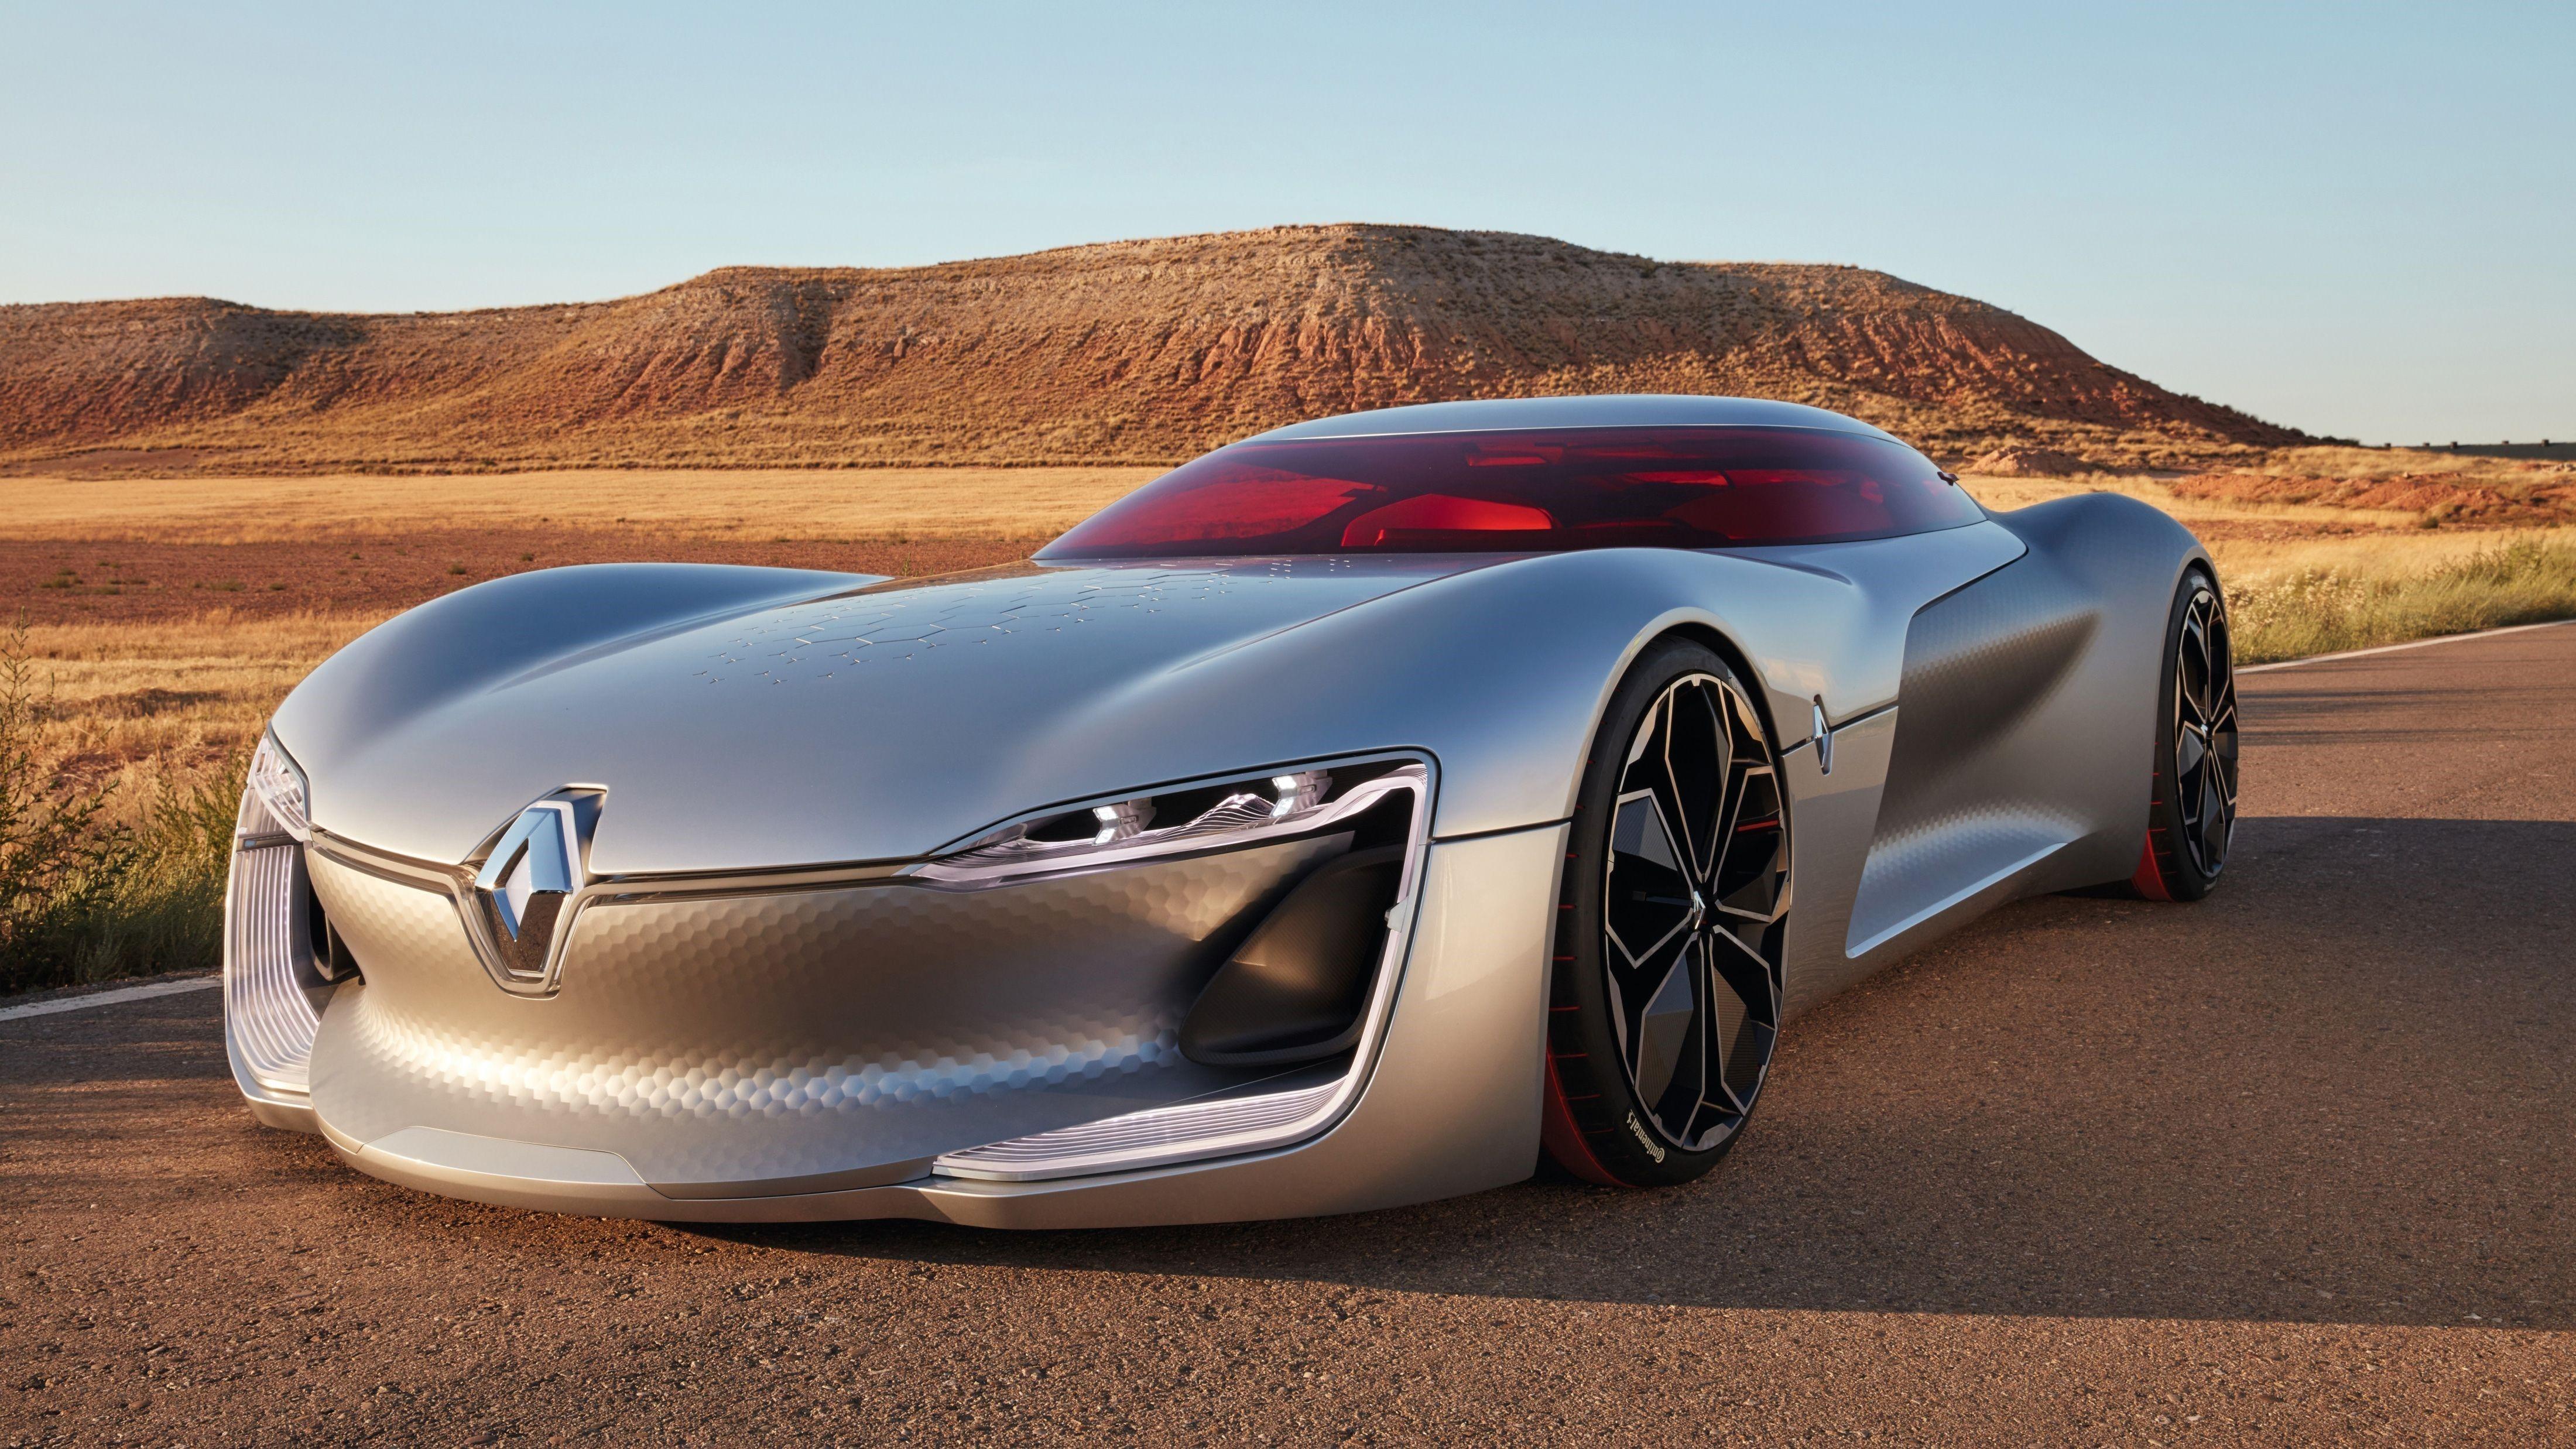 Future Cars Wallpaper